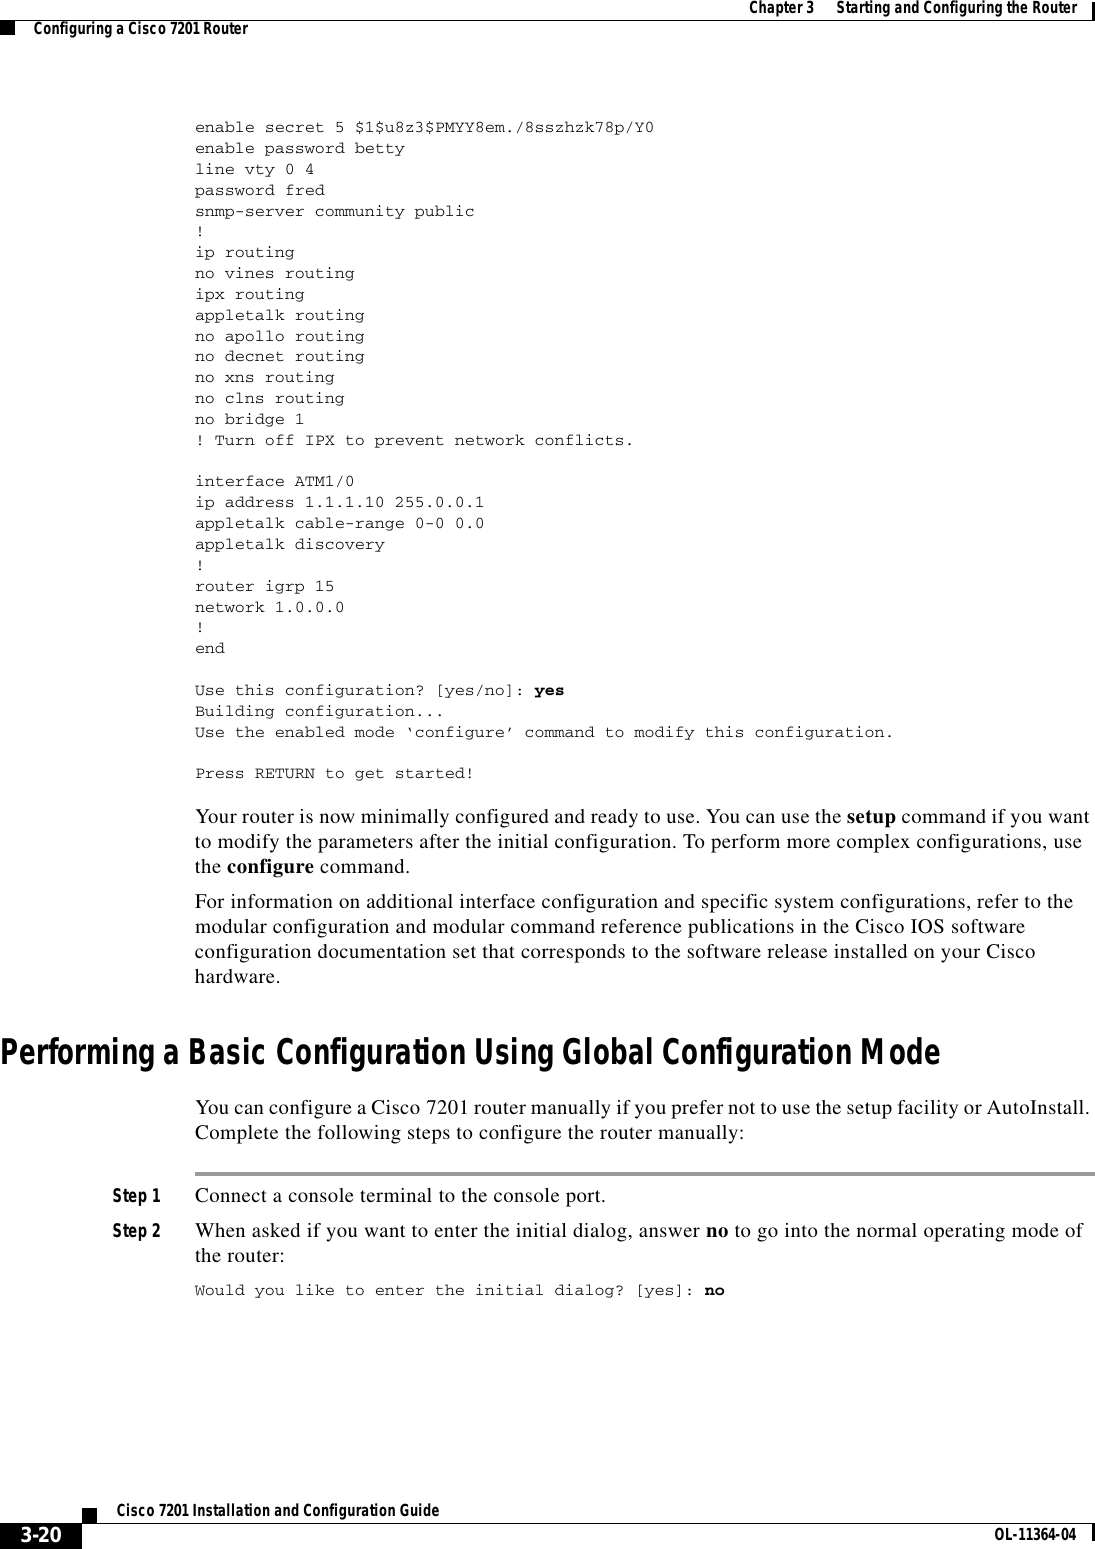 Cisco Systems Cisco7201 Installation And Configuration Guide